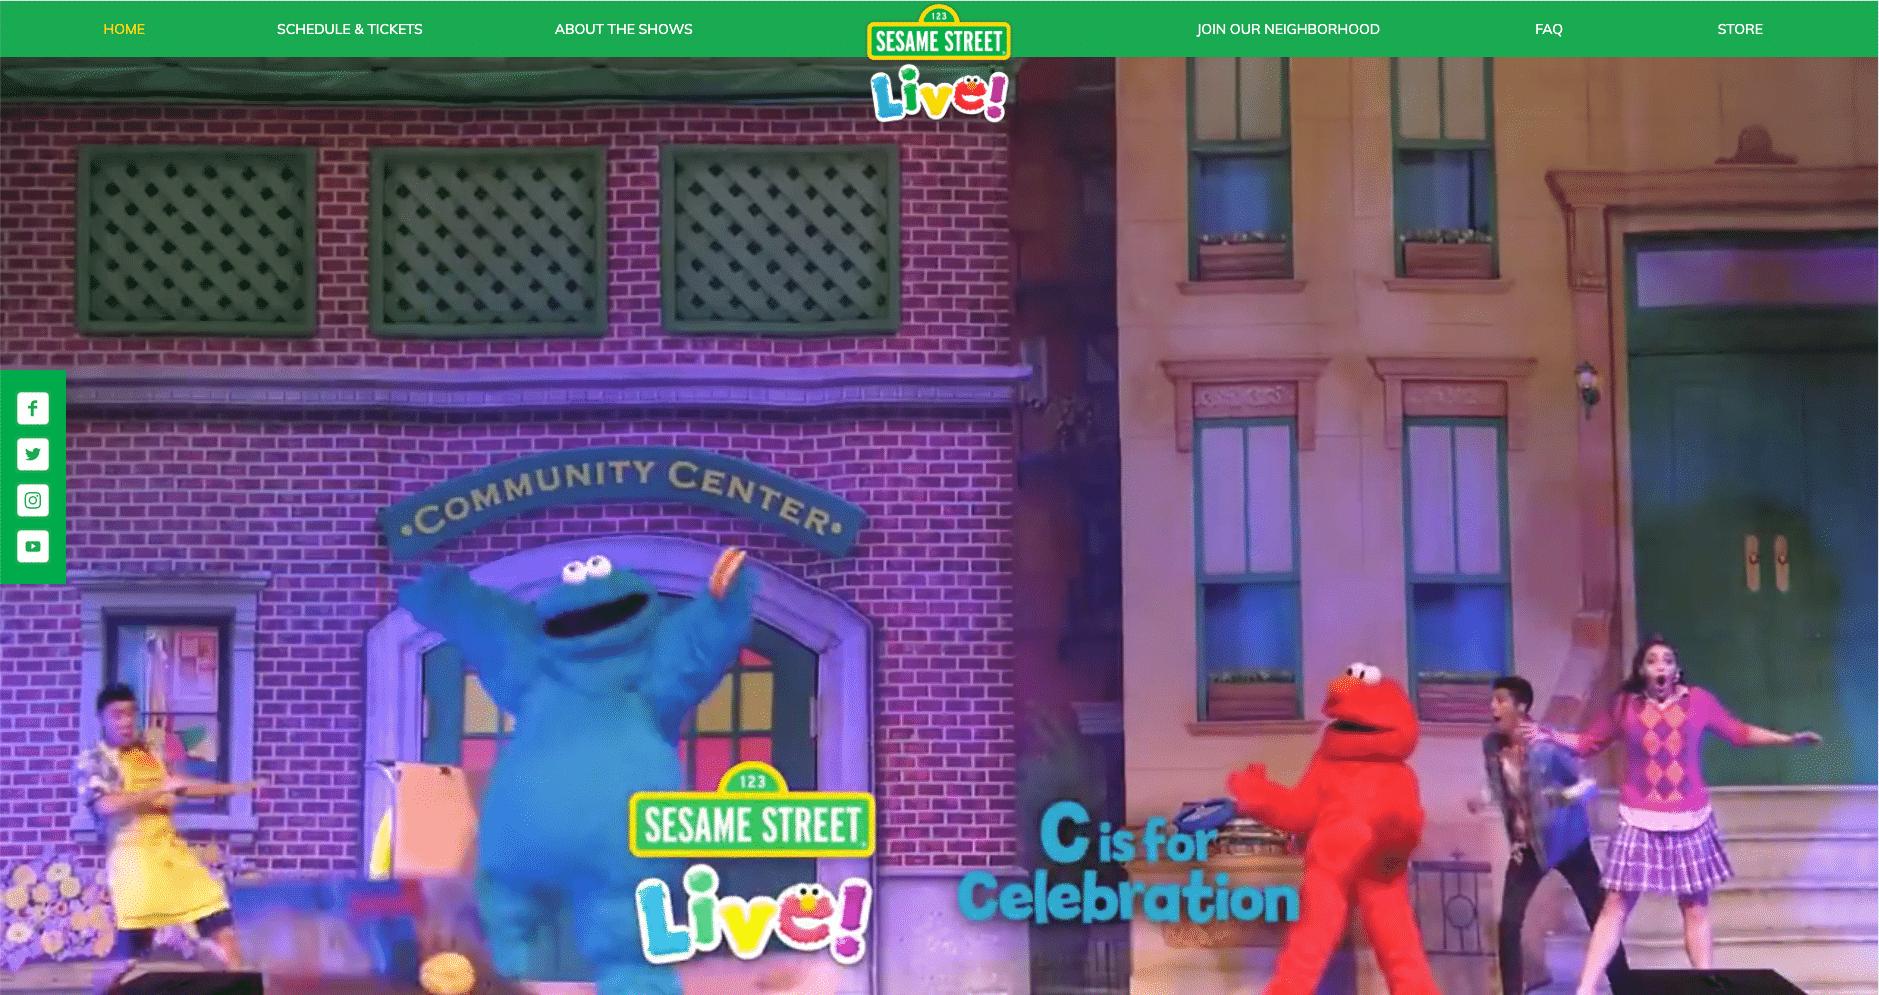 Sesame Street Live, showets live performance-hub